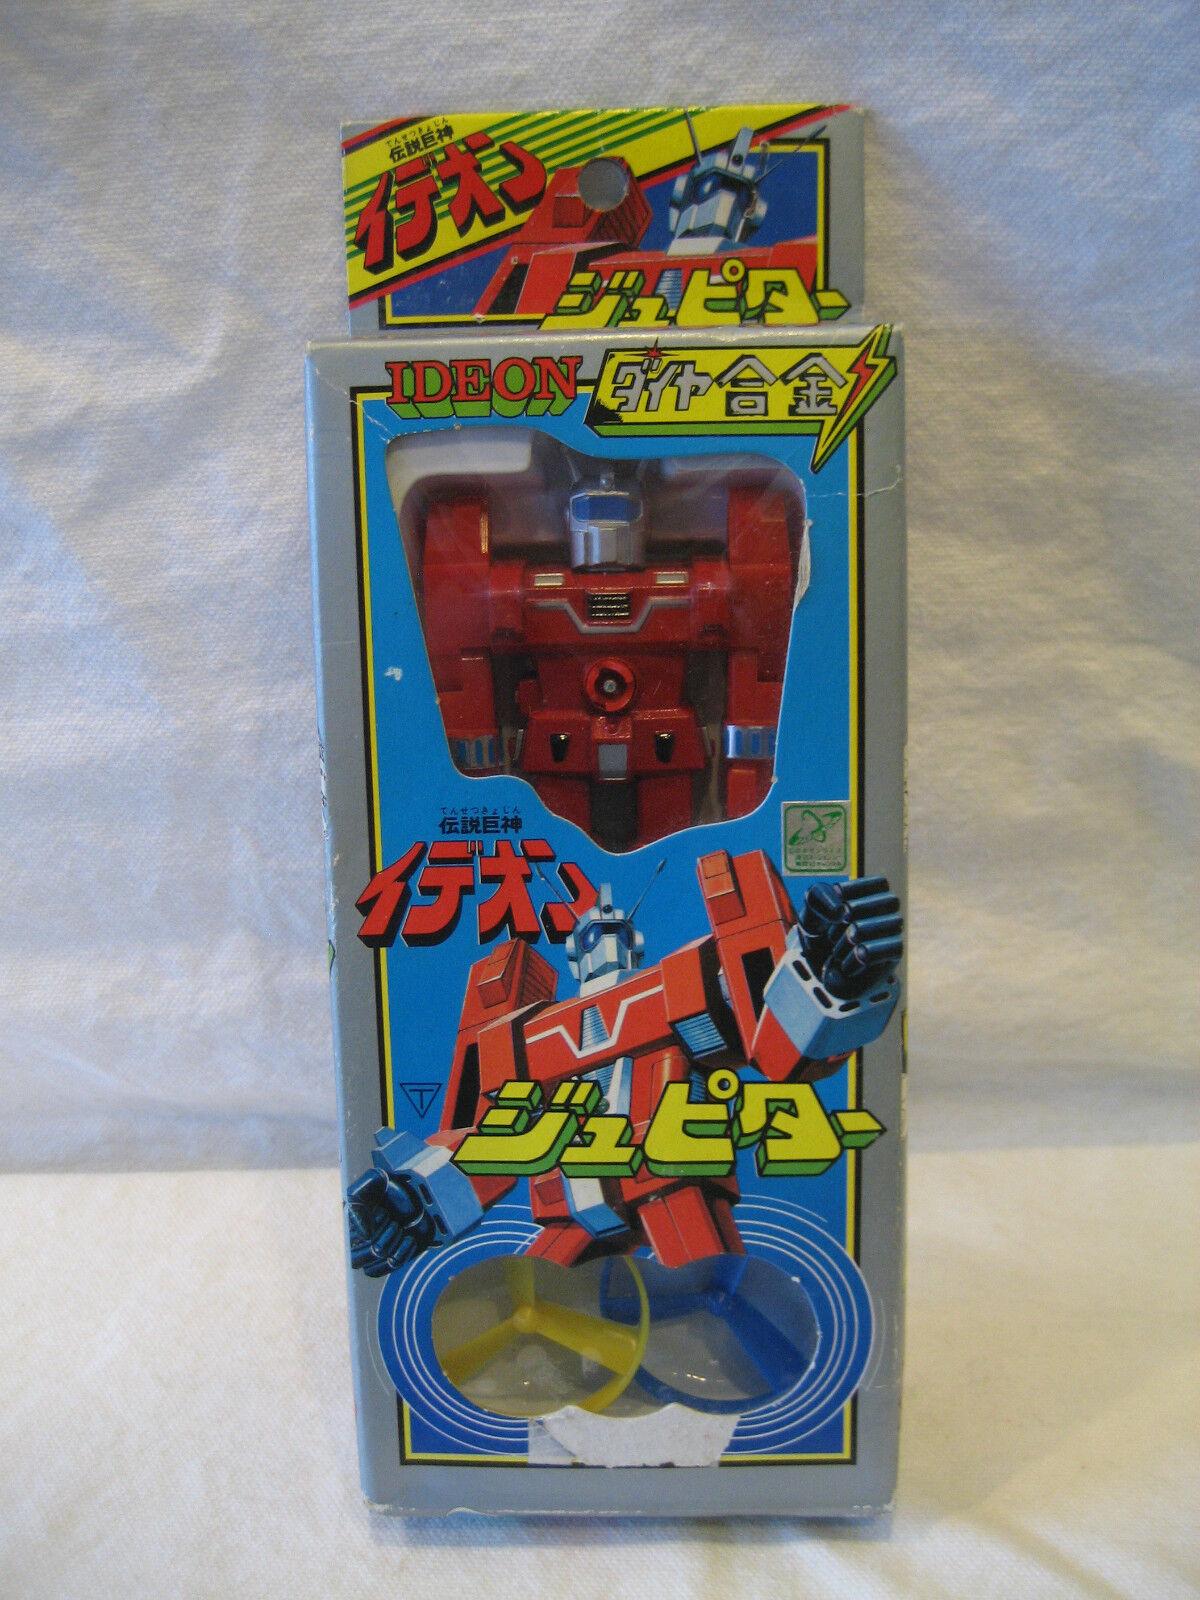 MIB vintage Space Runaway IDEON chogokin diecast metal Japanese toy Japan ROBOT